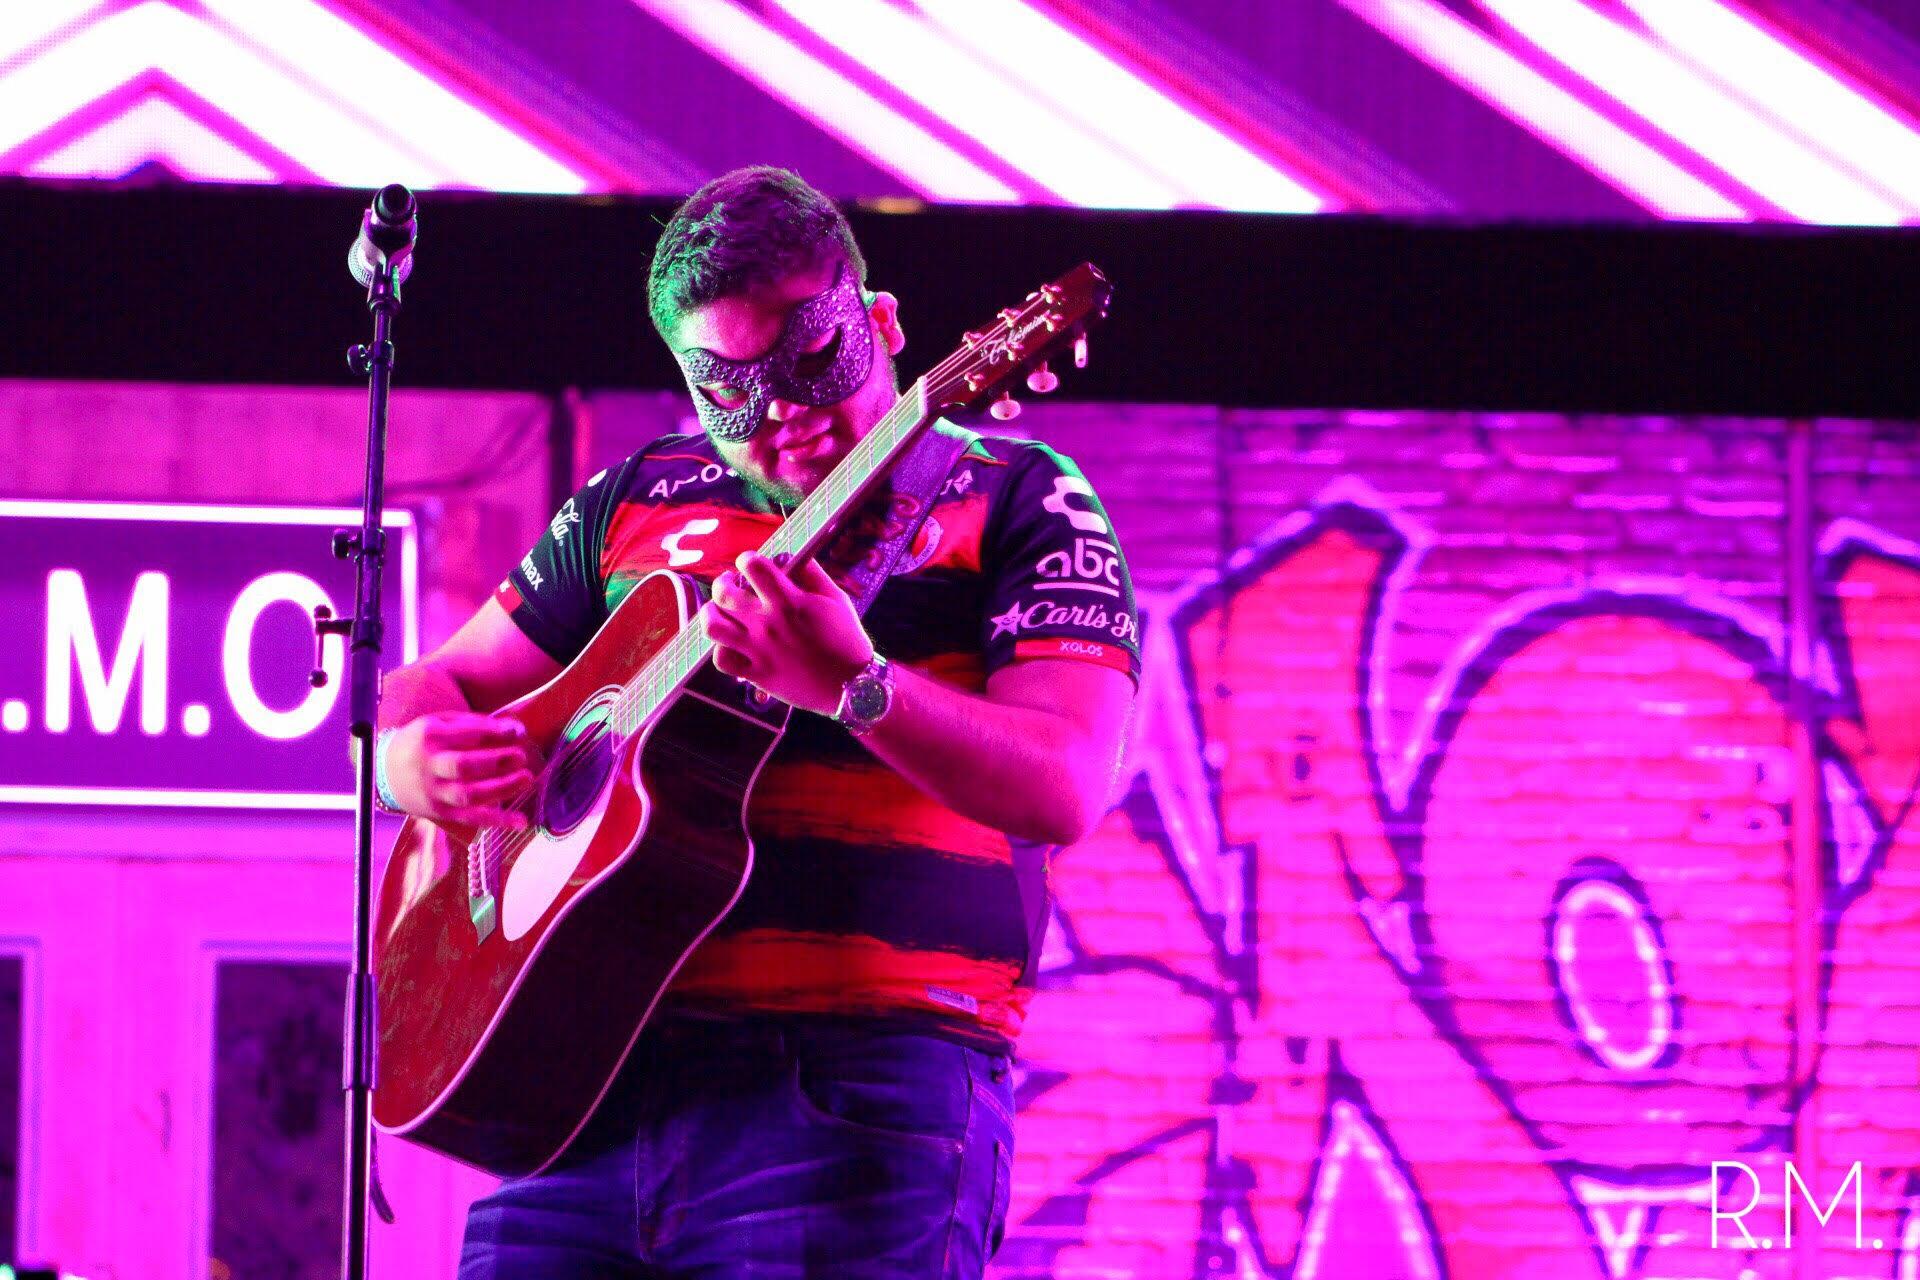 El De La Guitarra by Roger Martinez